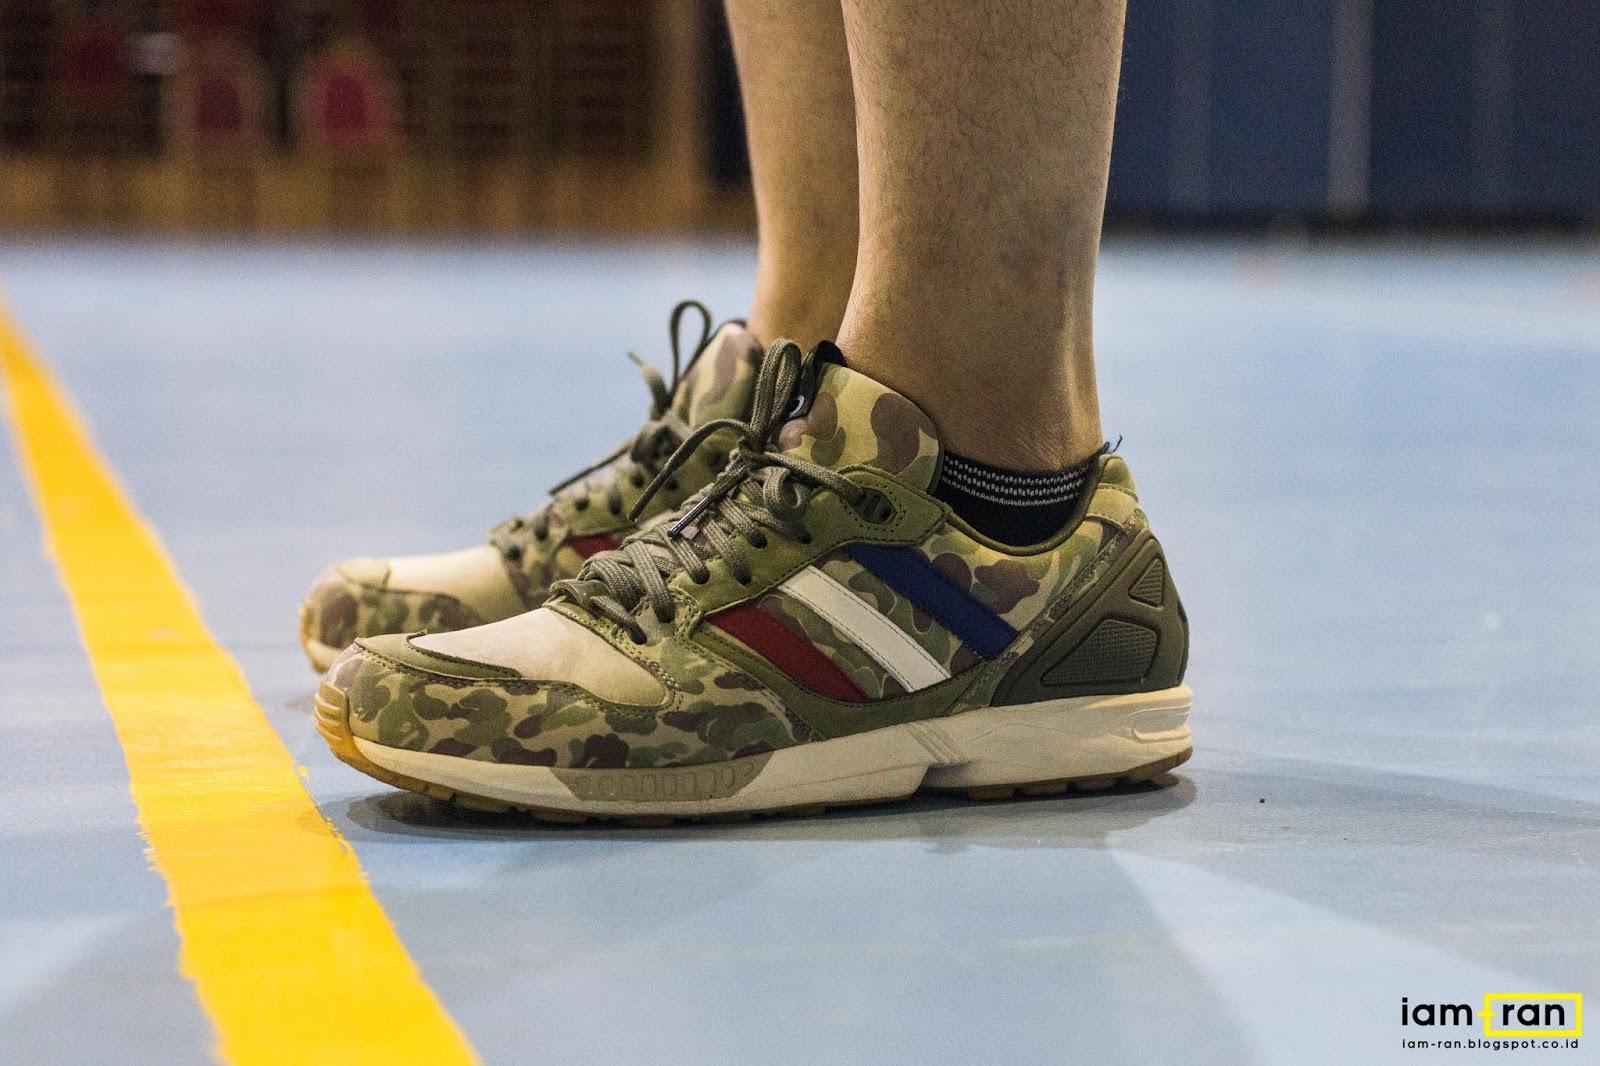 d9c3490b0 Vitra on feet. Sneakers   Adidas ZX5000 x BAPE X UNDFTD